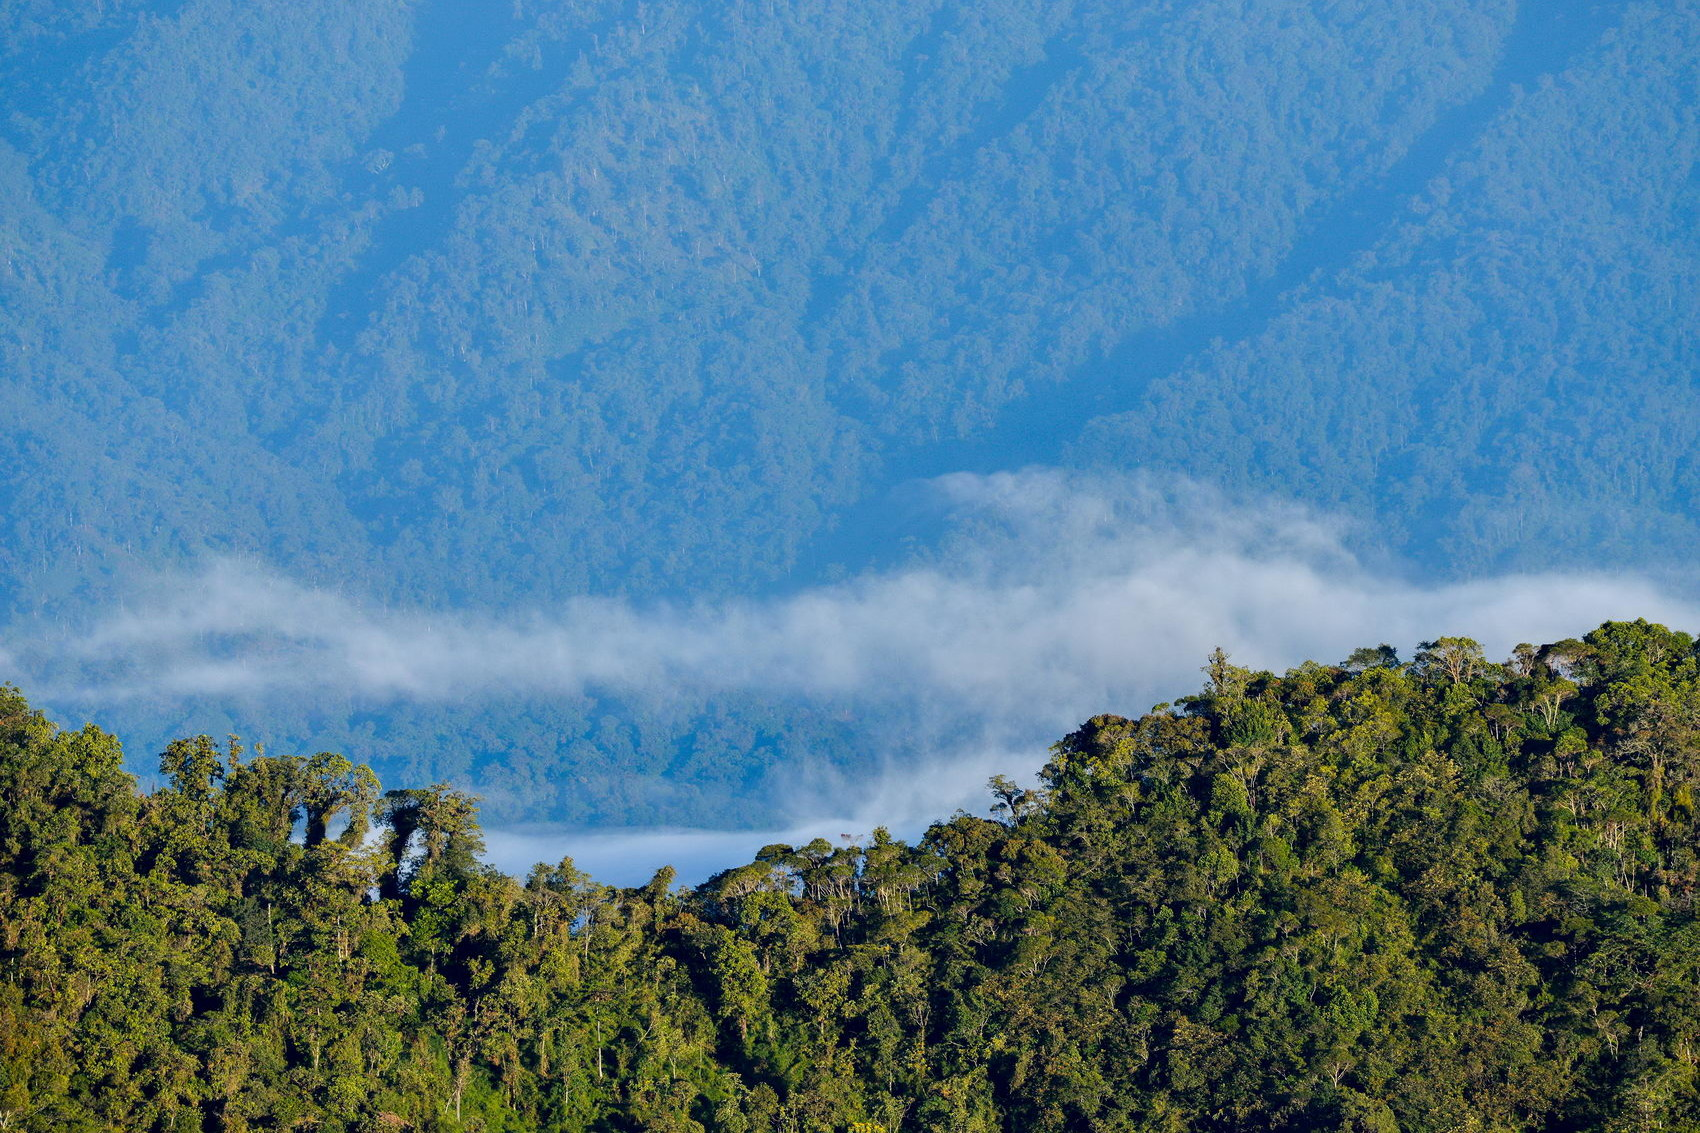 Reserva del Mashpi, protegiendo los bosques andinos